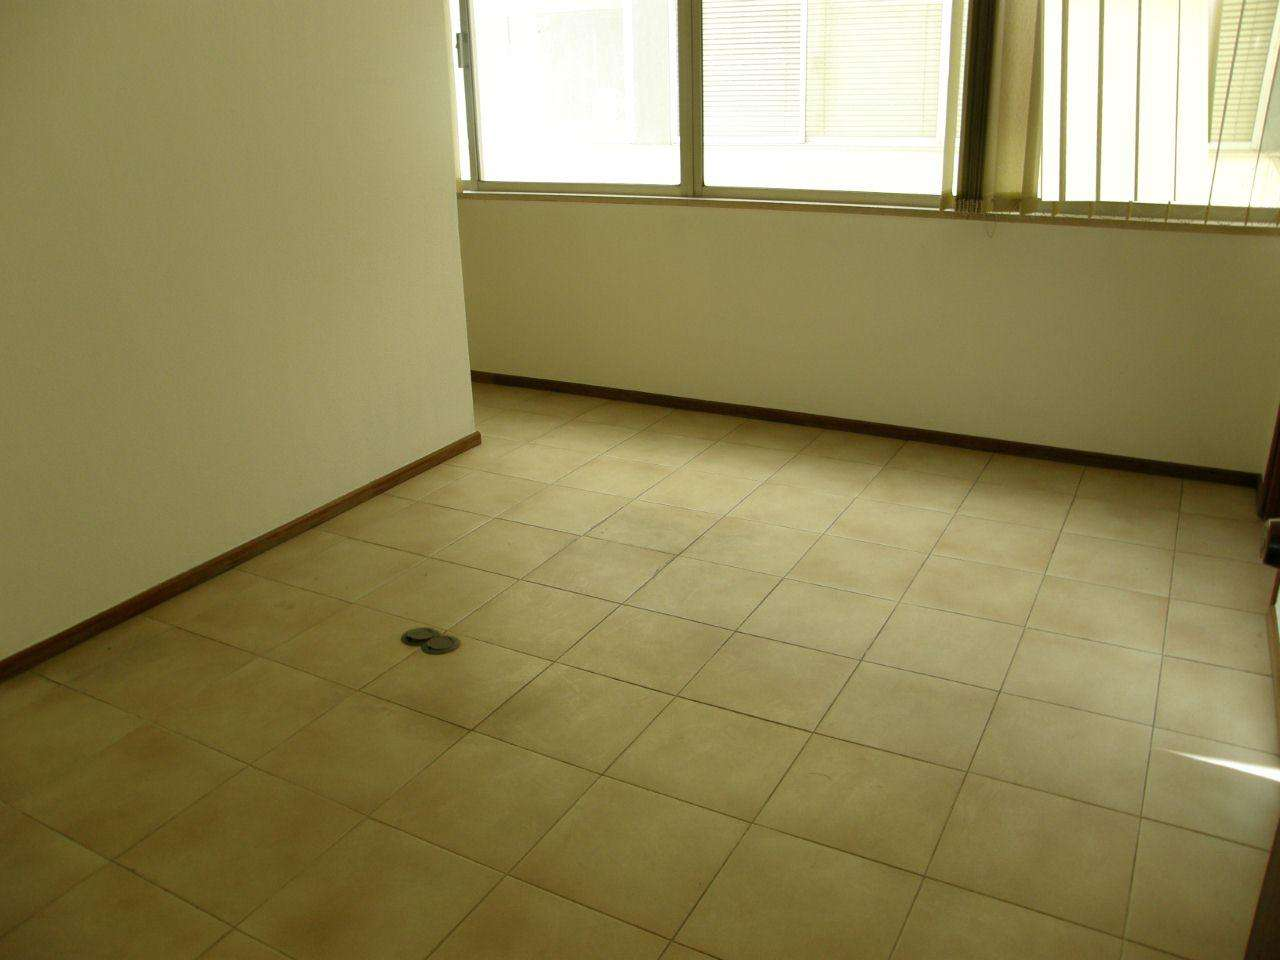 Escritório para arrendar, Leiria, Pousos, Barreira e Cortes, Leiria - Foto 2